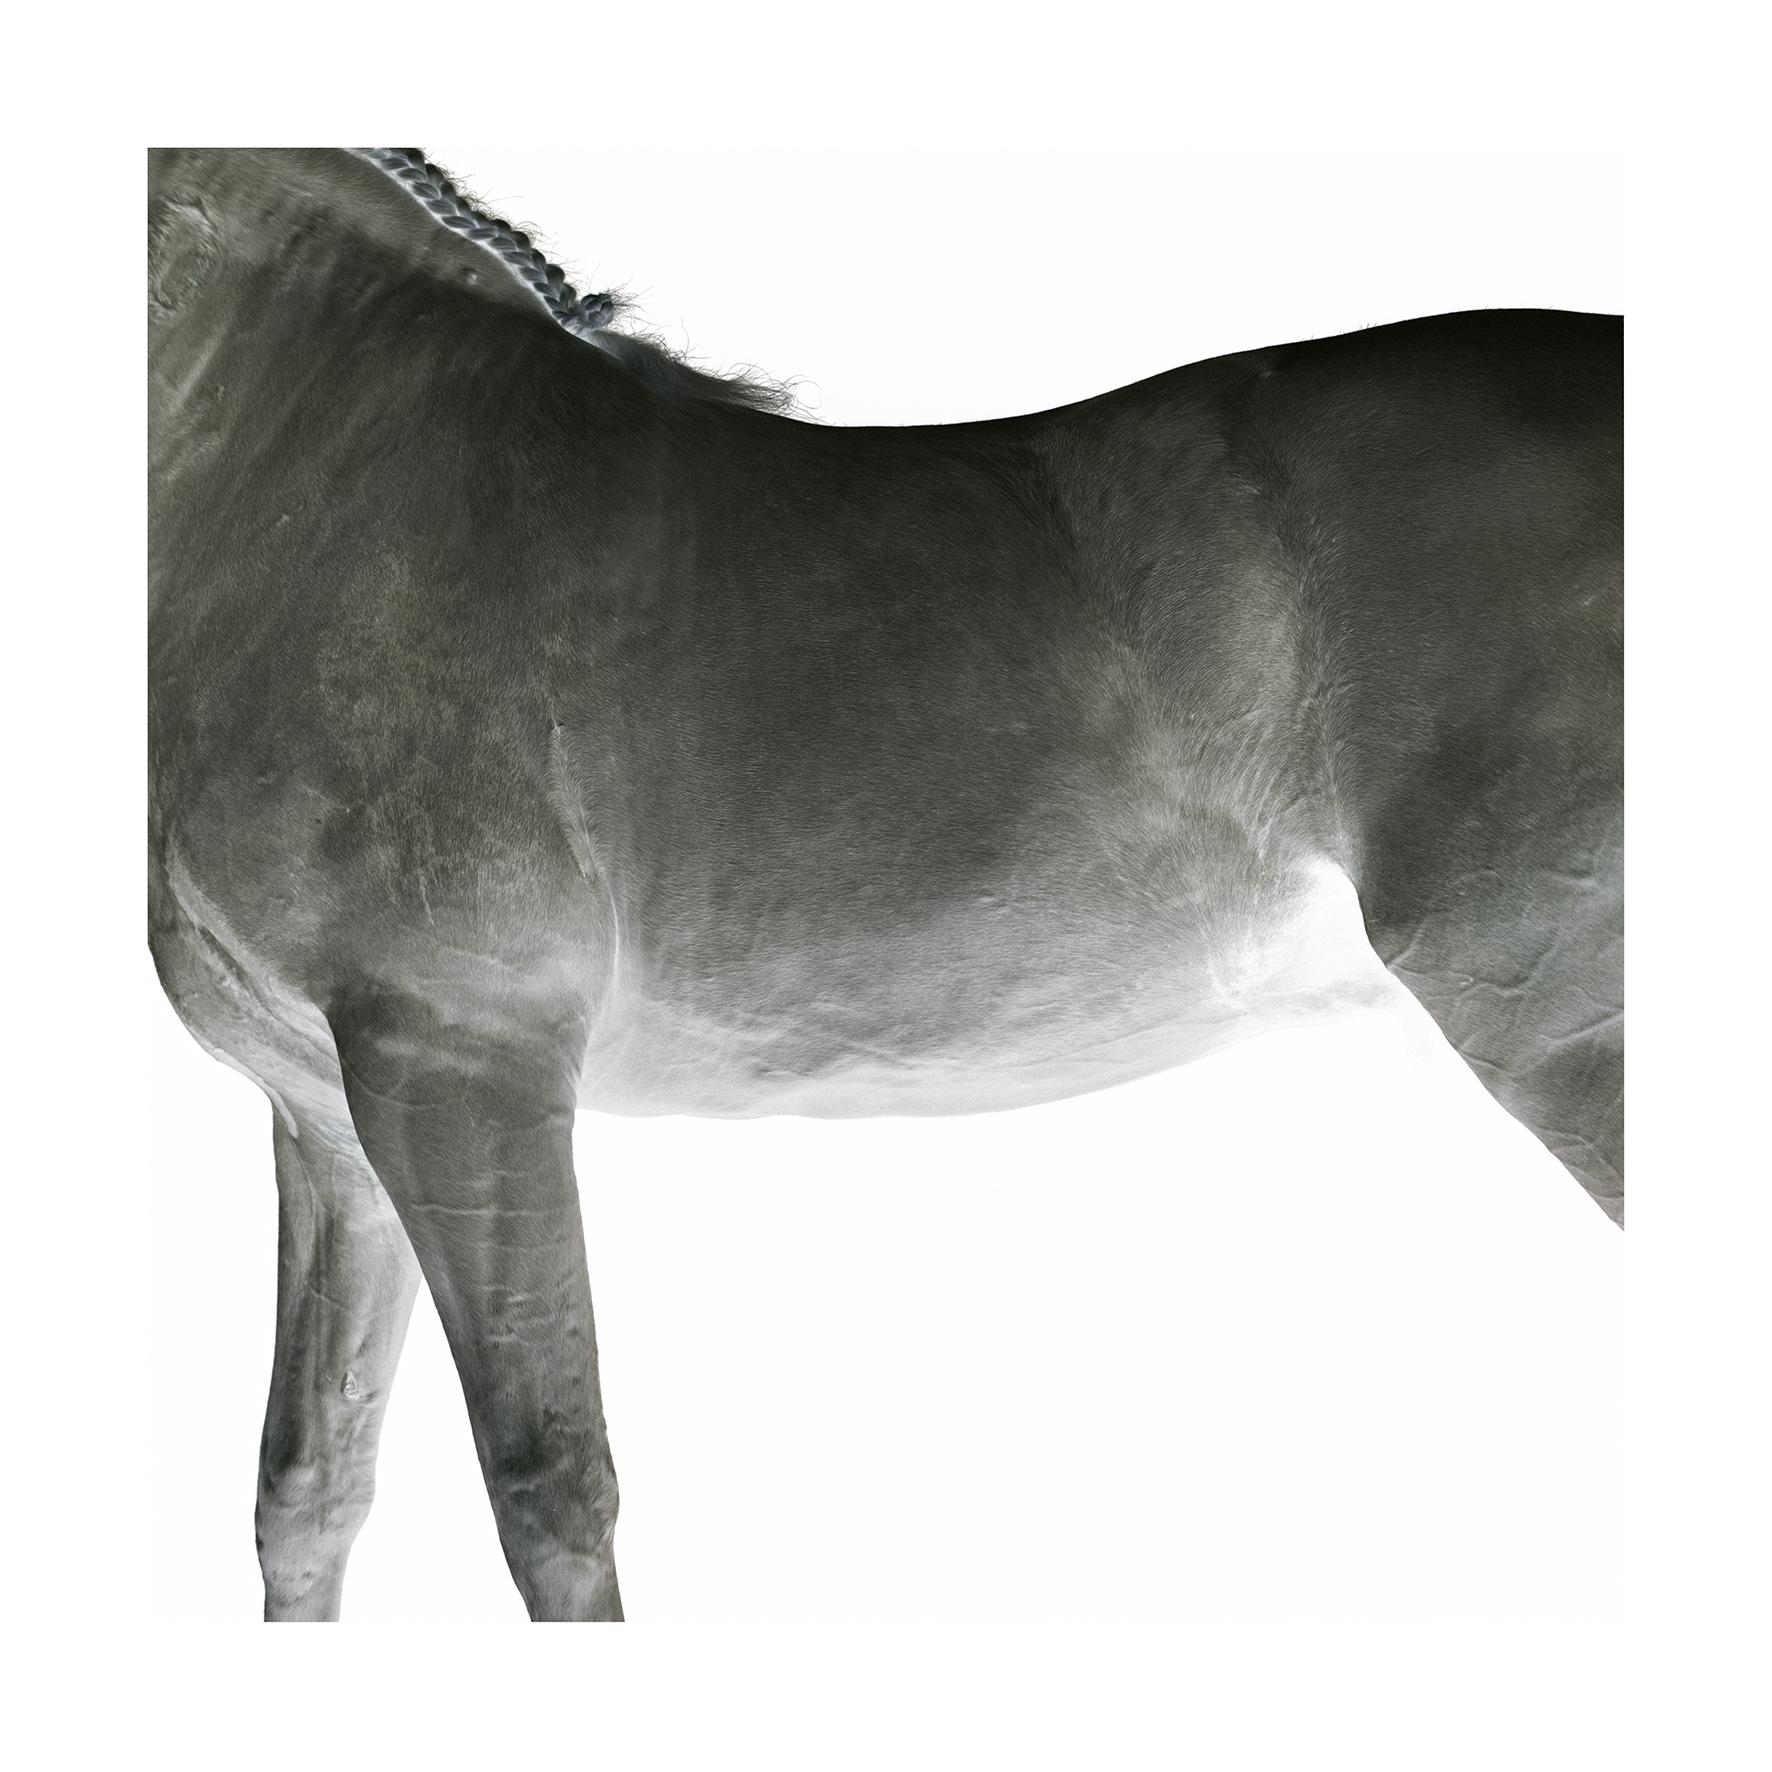 Partizan-3 (negative).jpg